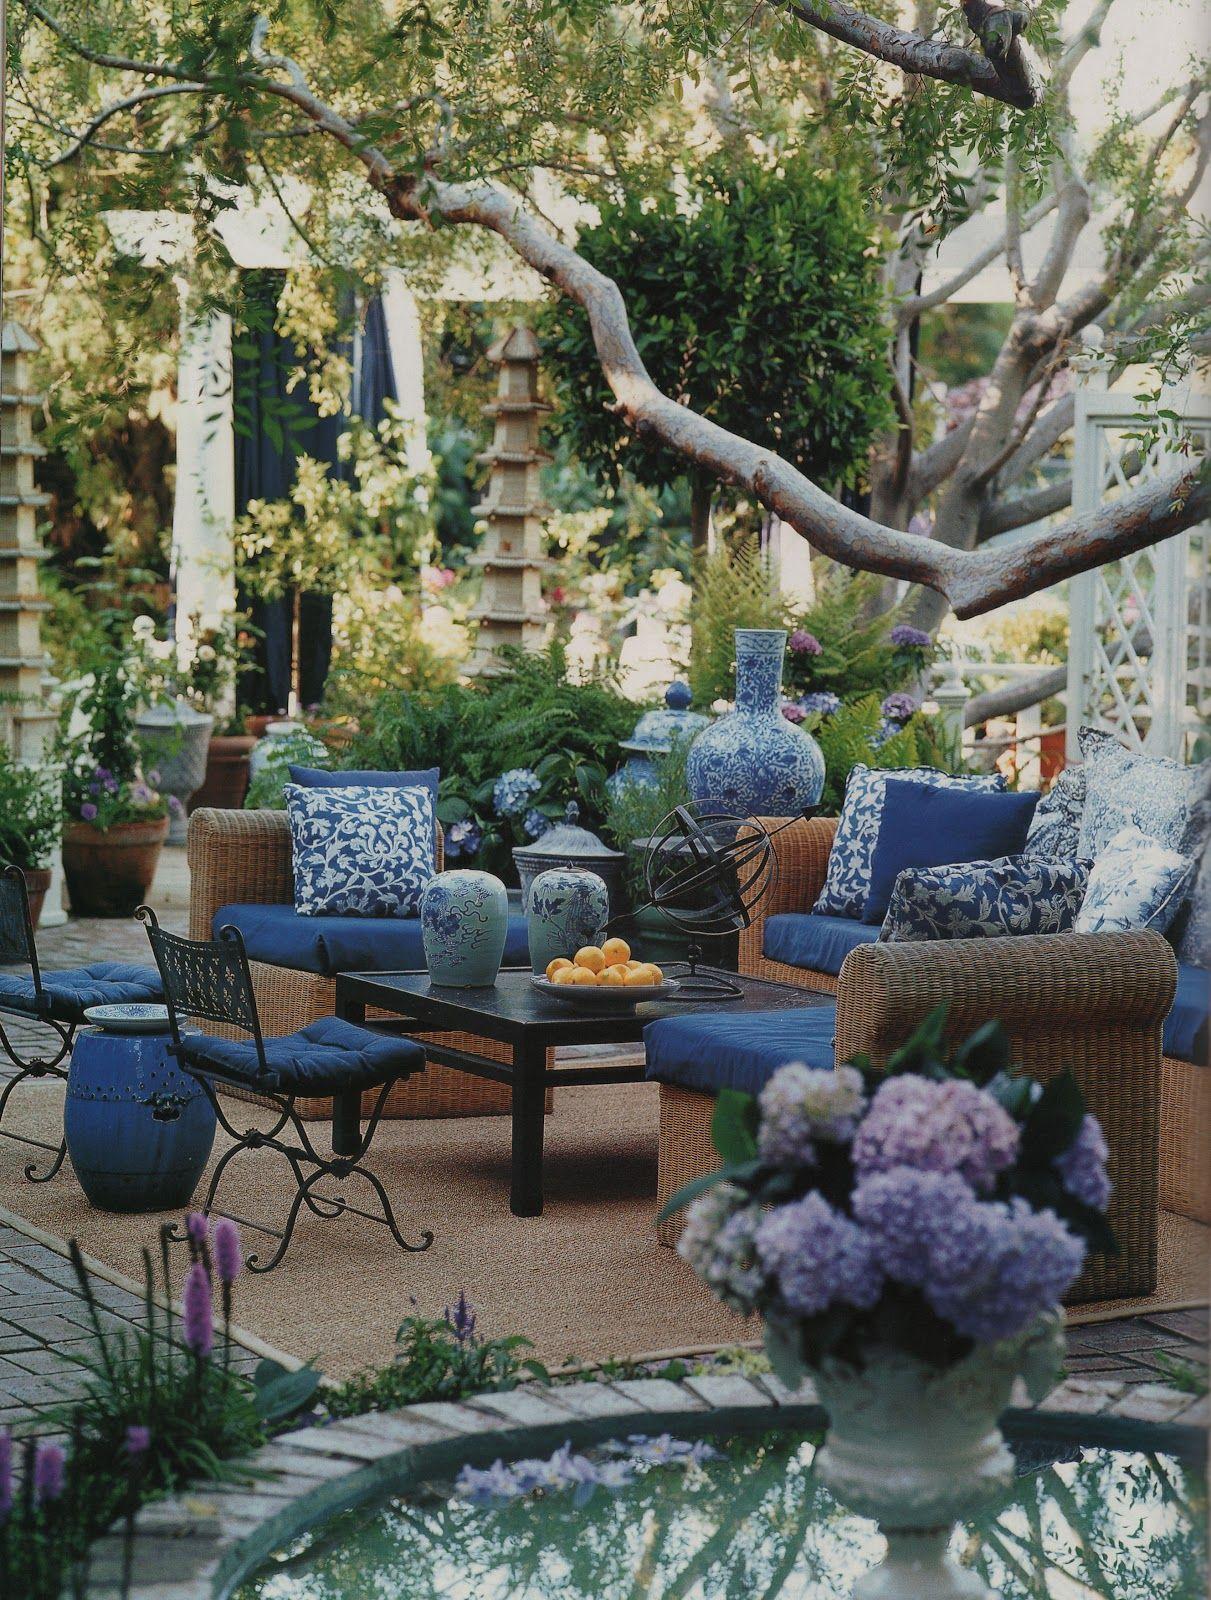 Blue and white monday art para el hogar jard n y ideas para - Hogar y jardin castellon ...